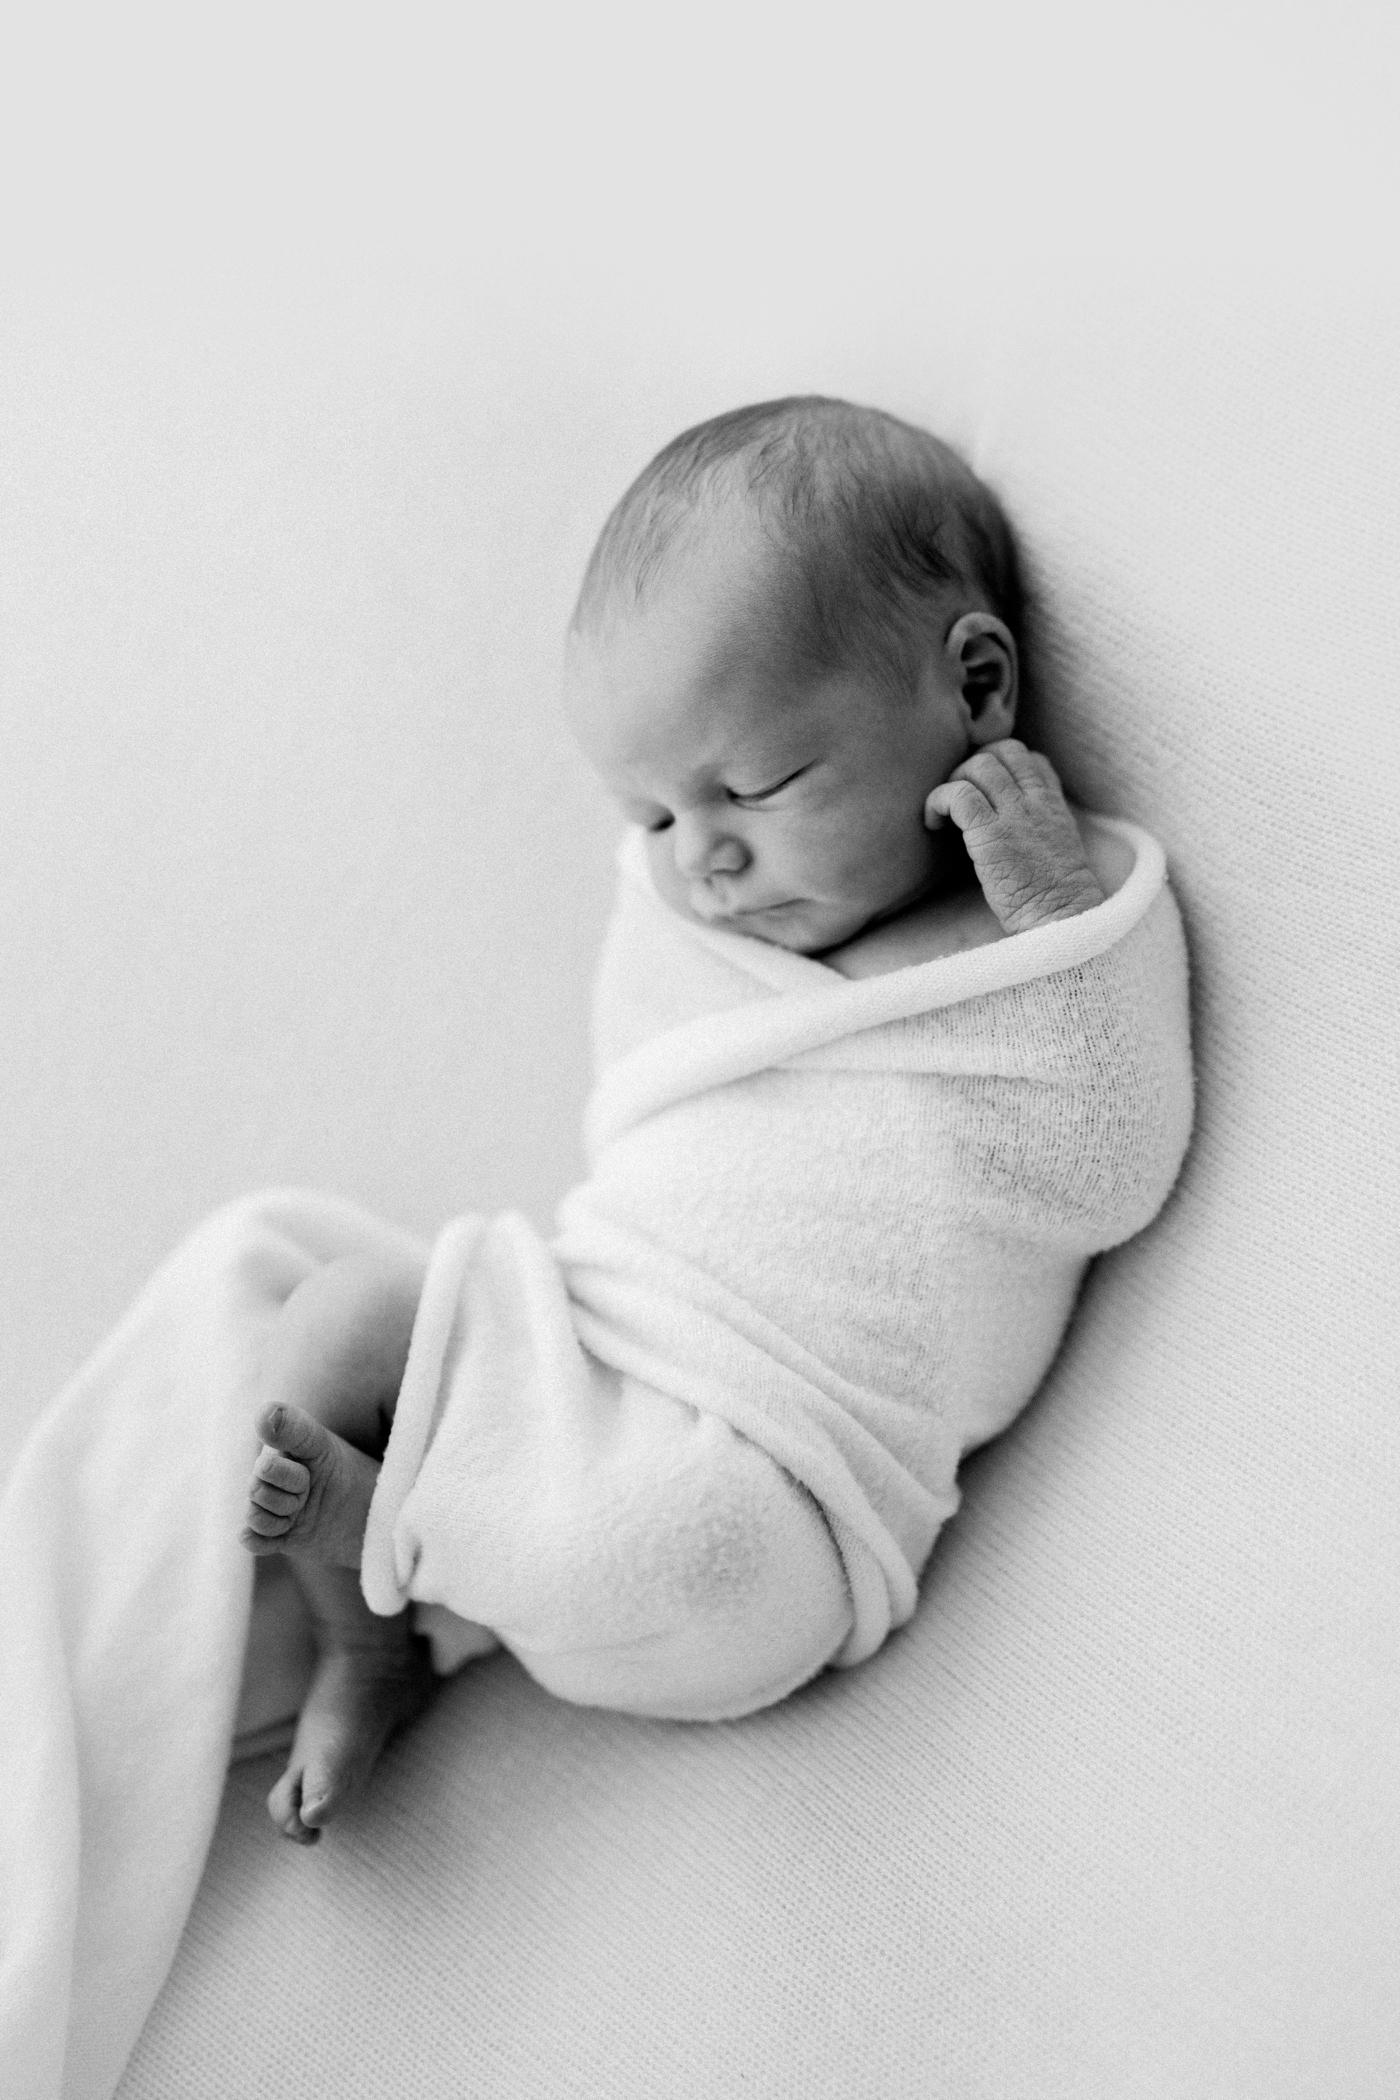 Baby William - Natural Newborn Photography in Adelaide - Simple and Beautiful Newborn Photography - Katherine Schultz - Natural Light Newborn Photographer in Adelaide - www.katherineschultzphotography.com_0012.jpg